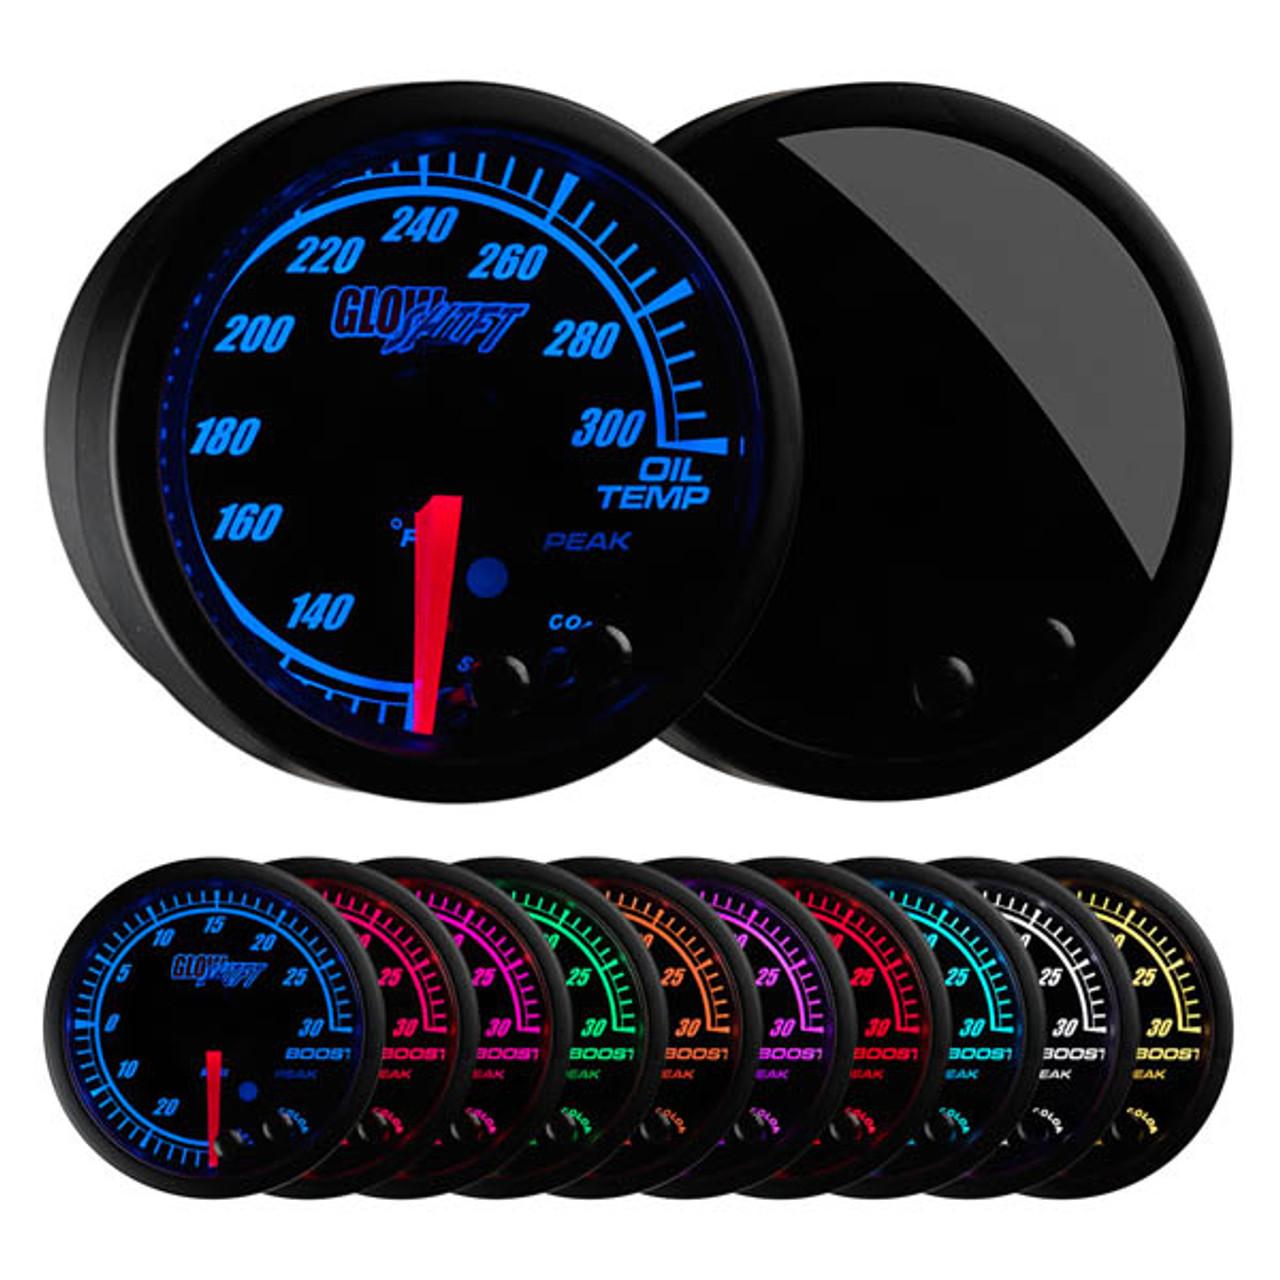 Glowshift Elite 10 Color Oil Temperature Gauge